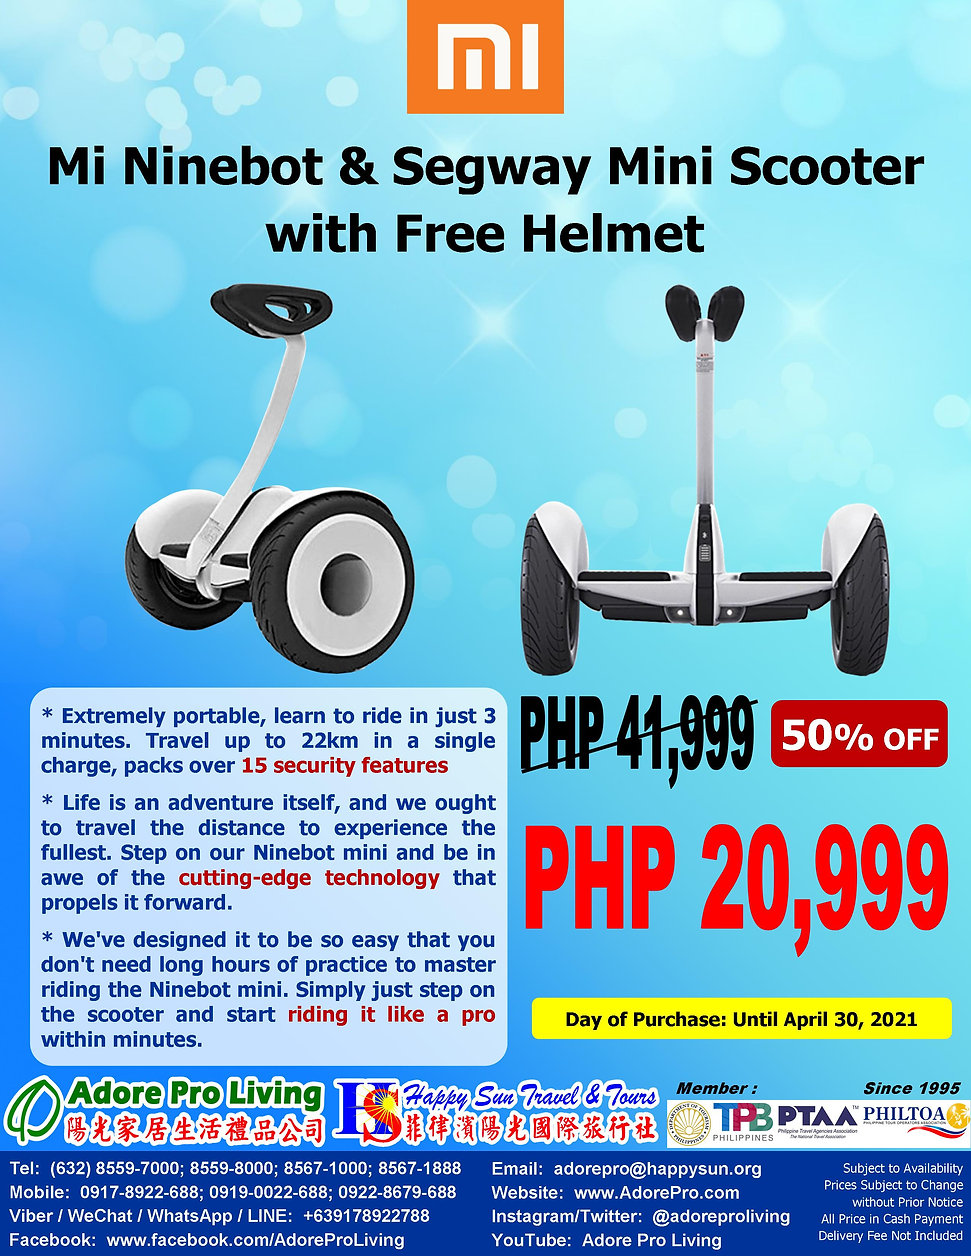 2B.NinebotSegwayMiniScooter_Mi_20210422.